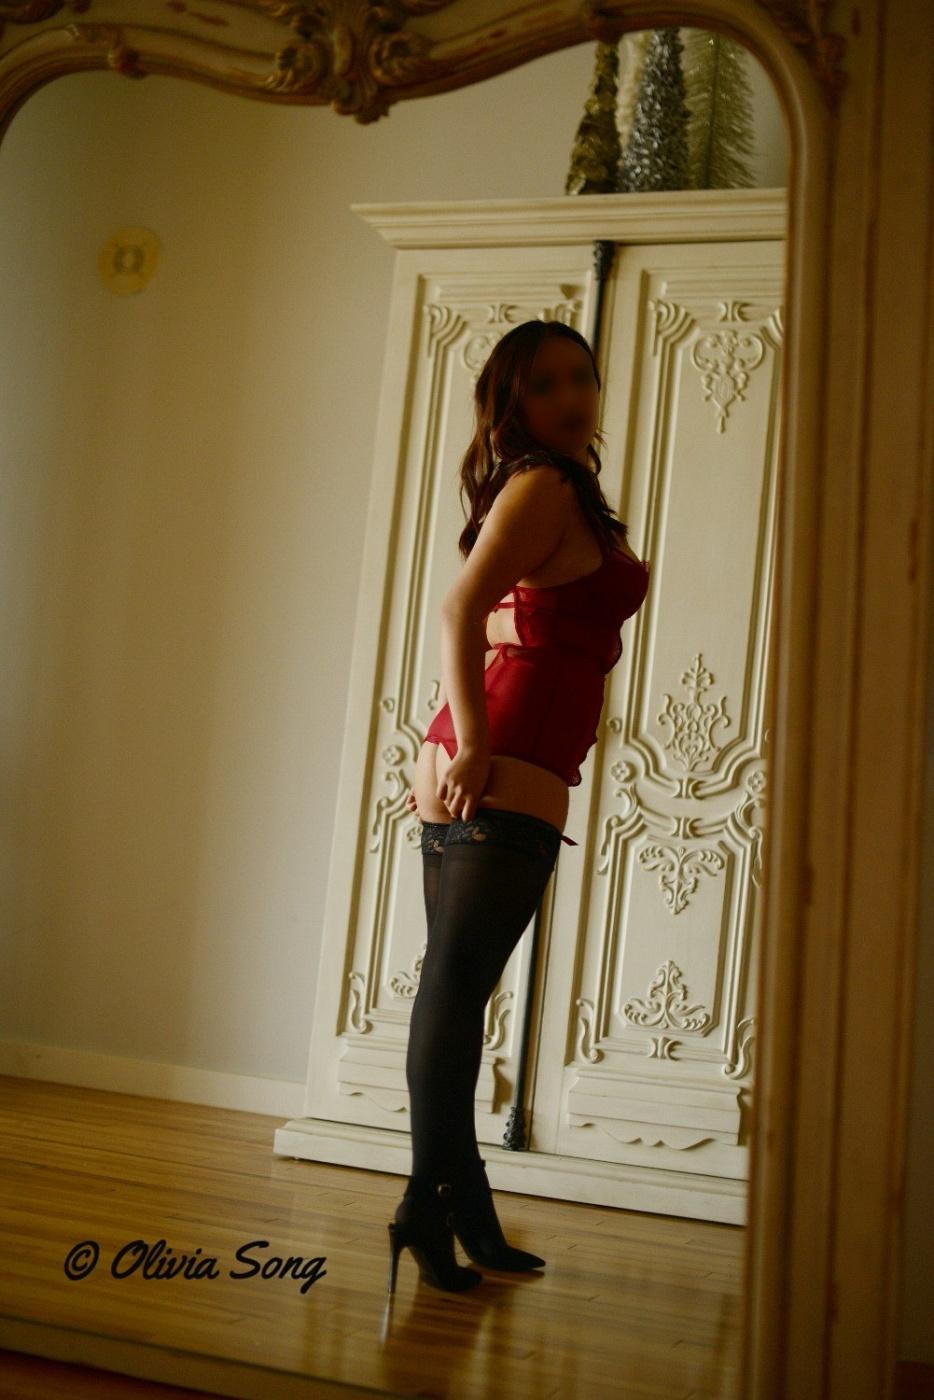 Olivia Song